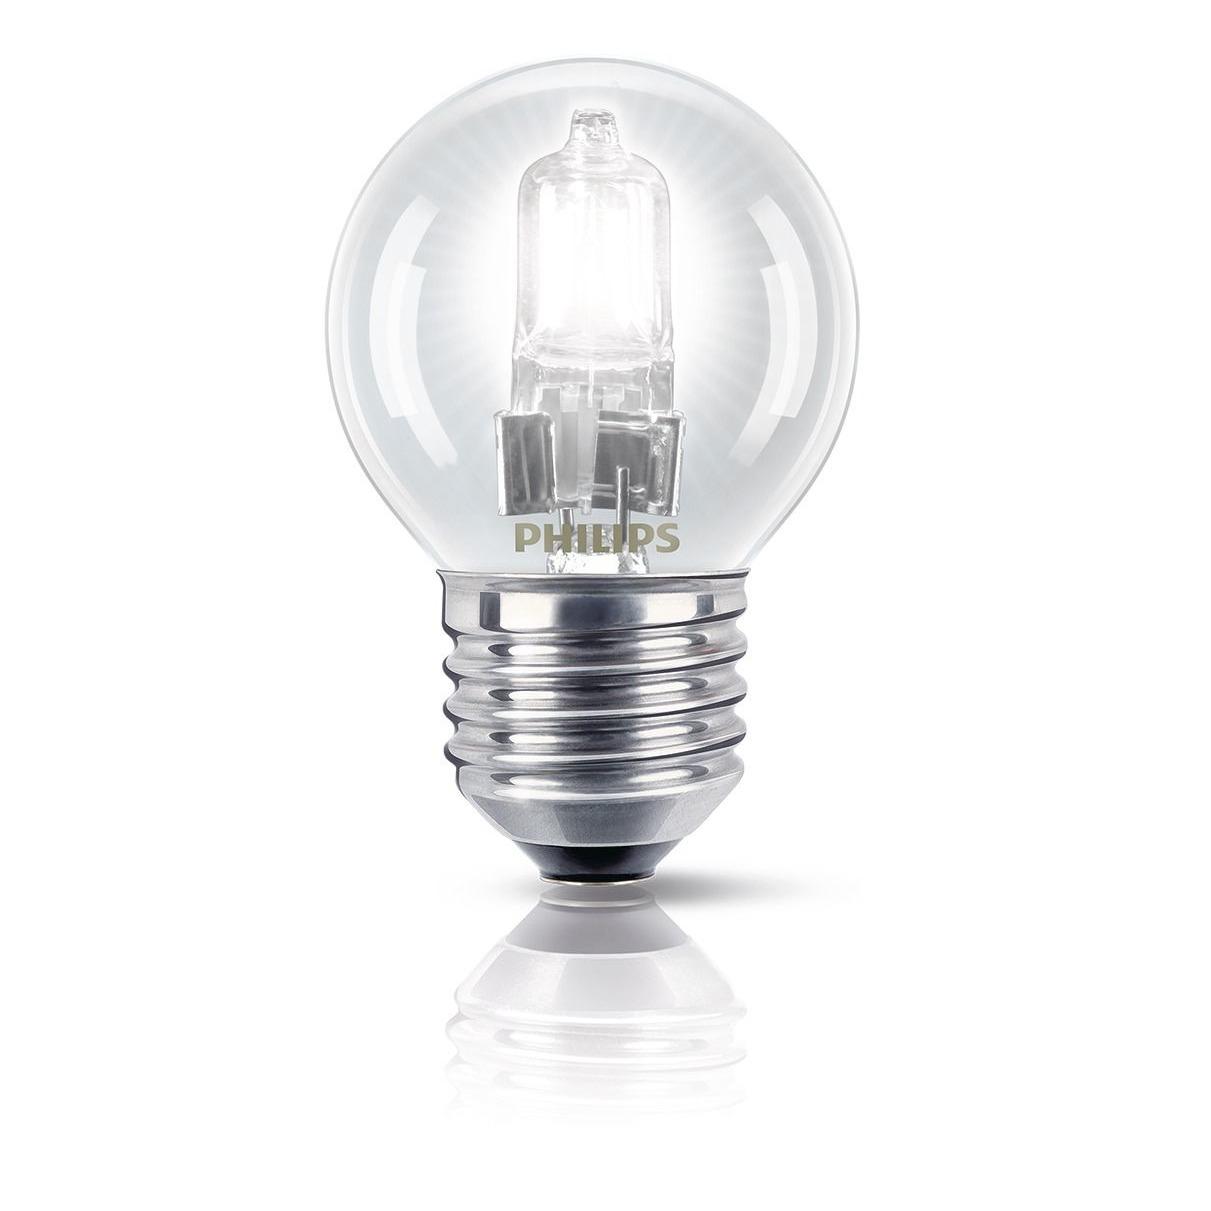 Philips halogeenlamp E27 18W 204Lm kogel